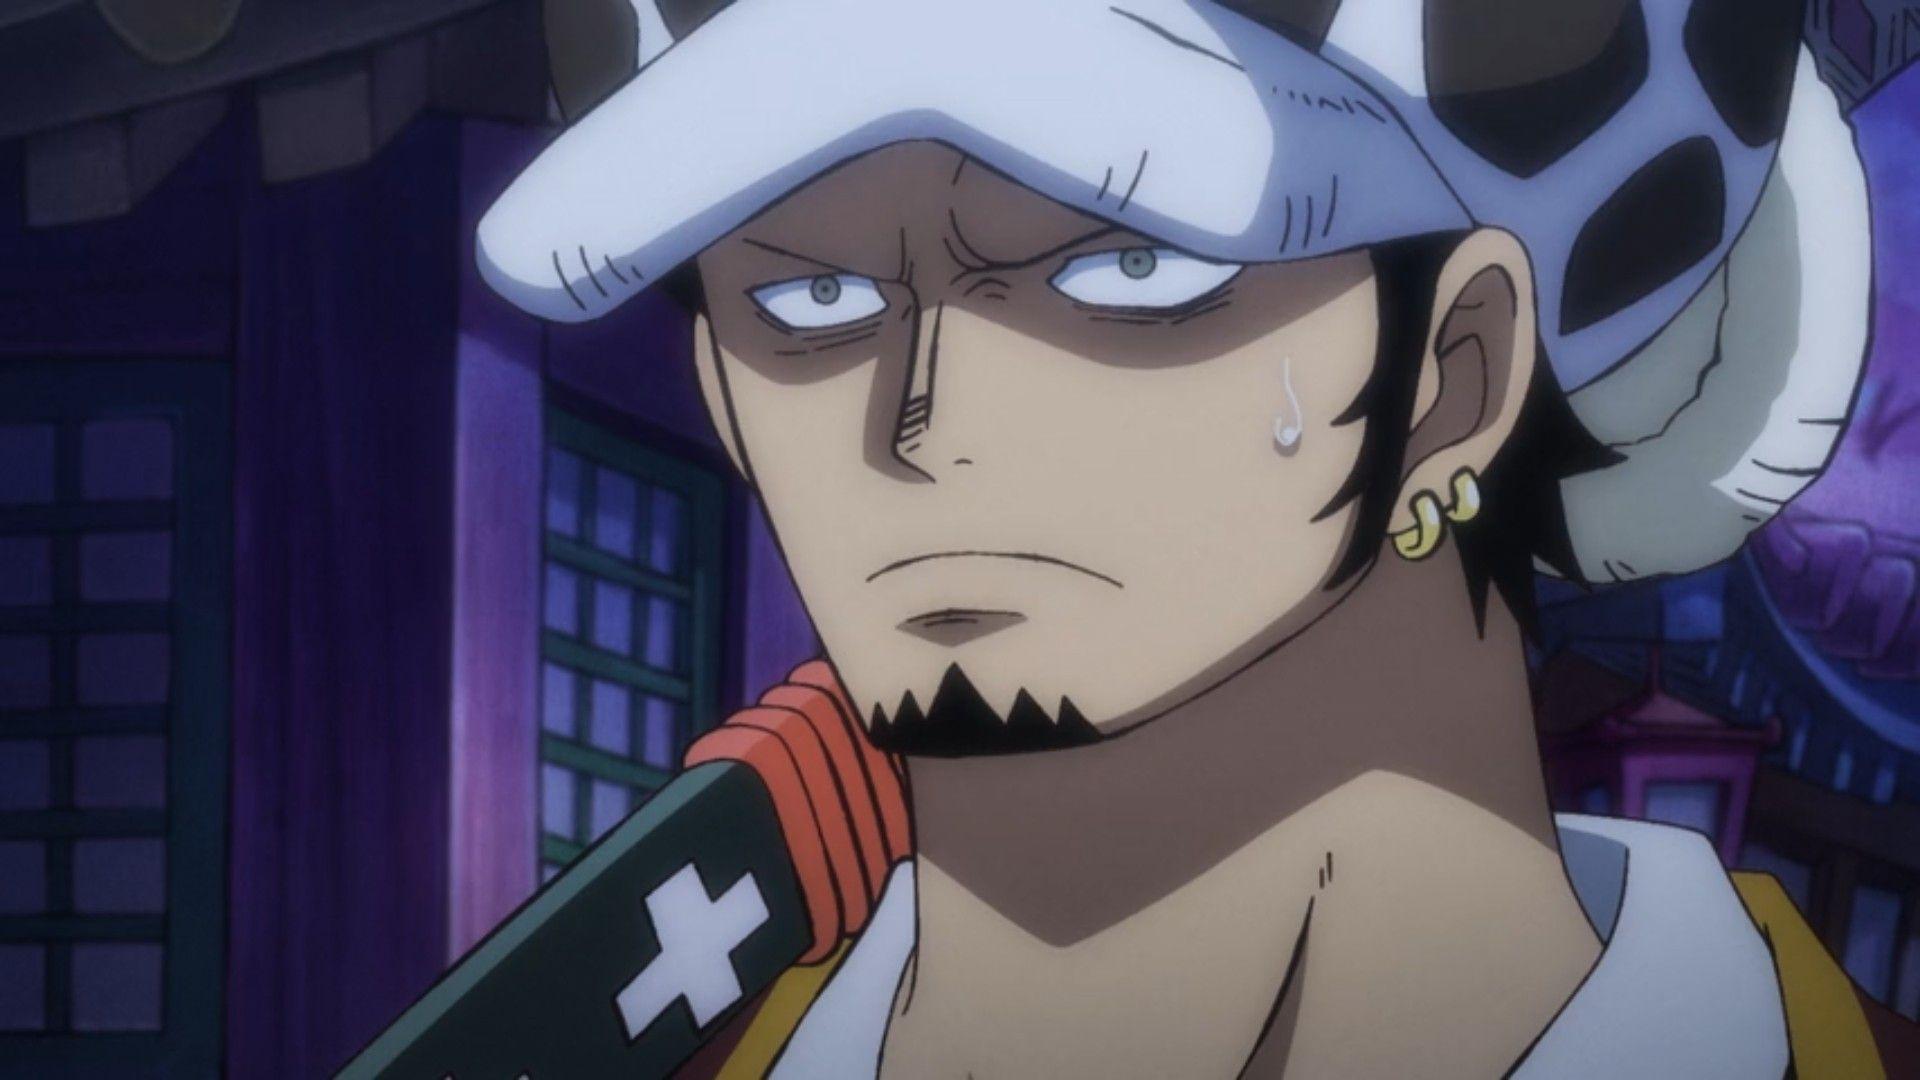 Pin By Law On Law Anime One Piece Anime Trafalgar Law One Piece Funny